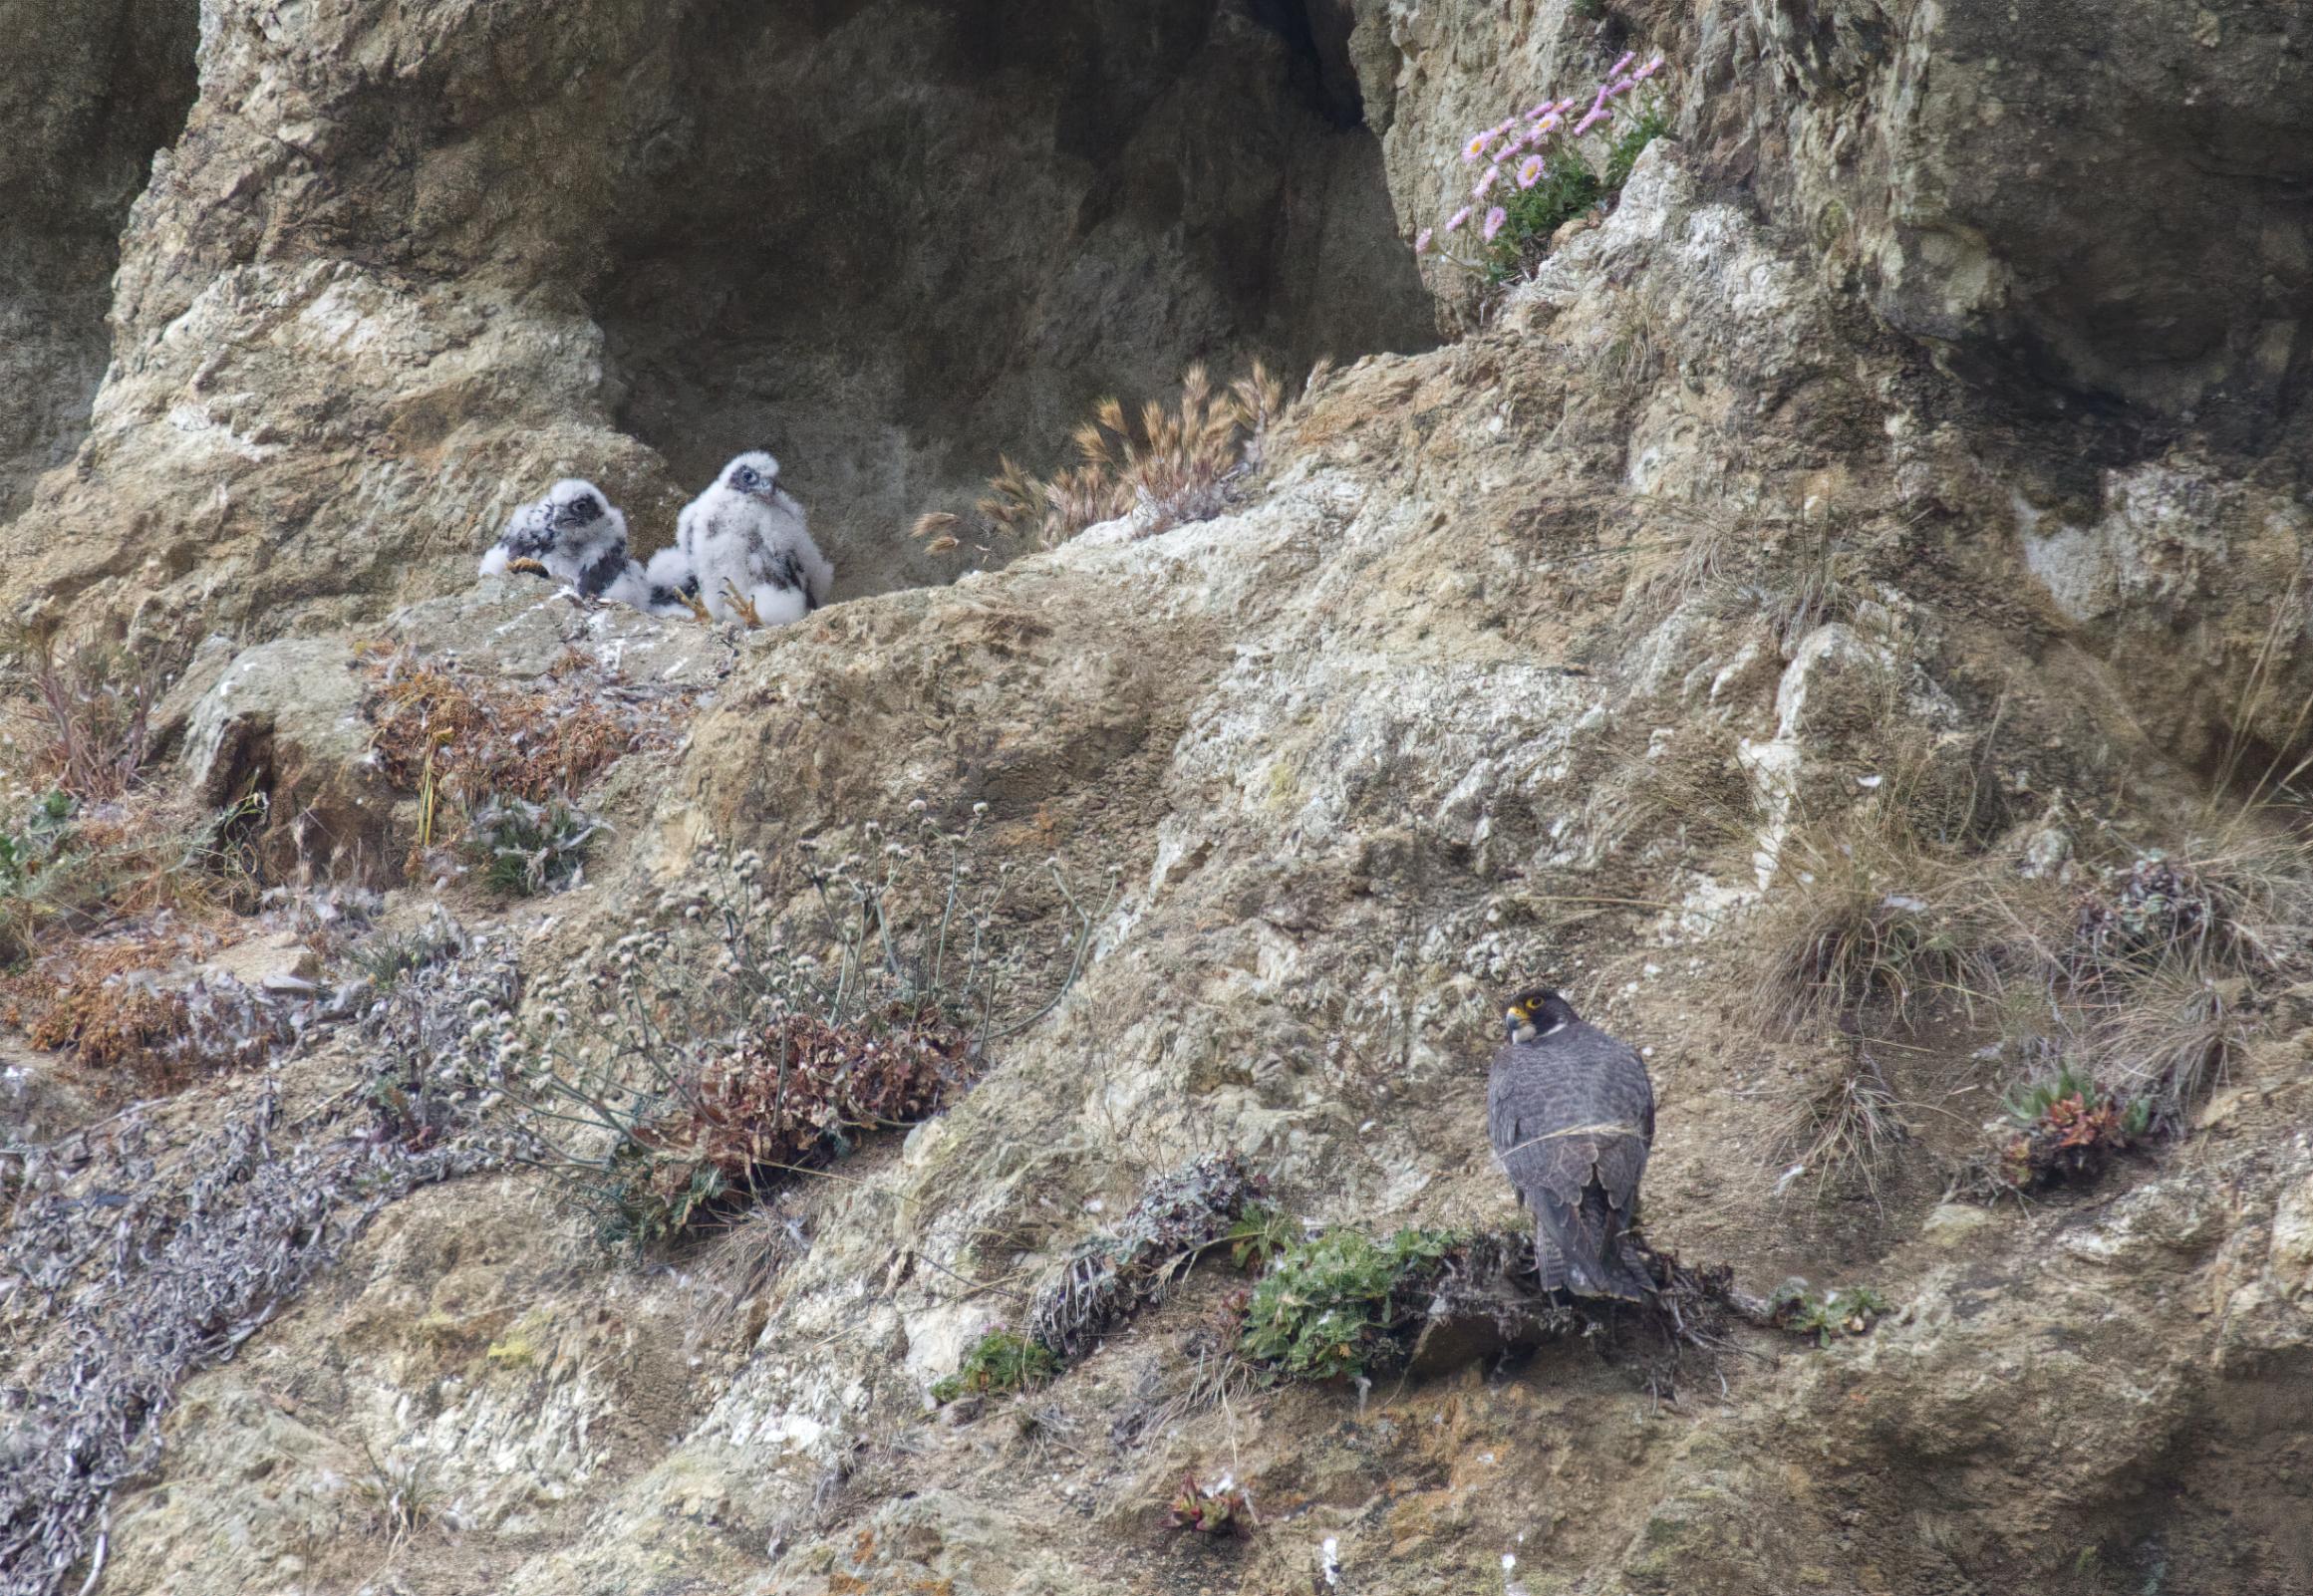 Peregrine falcon mom and chicks...